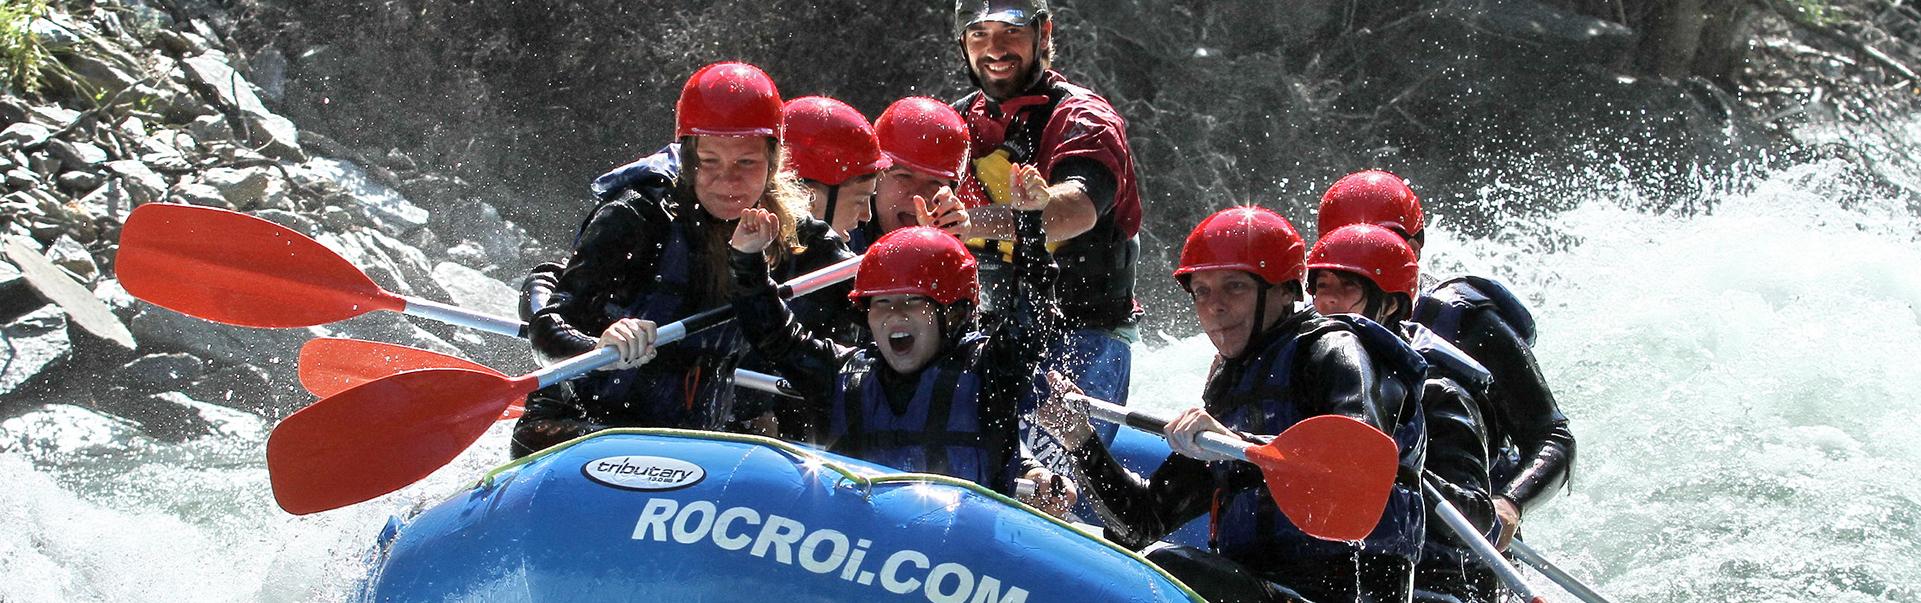 Season Rafting 2016